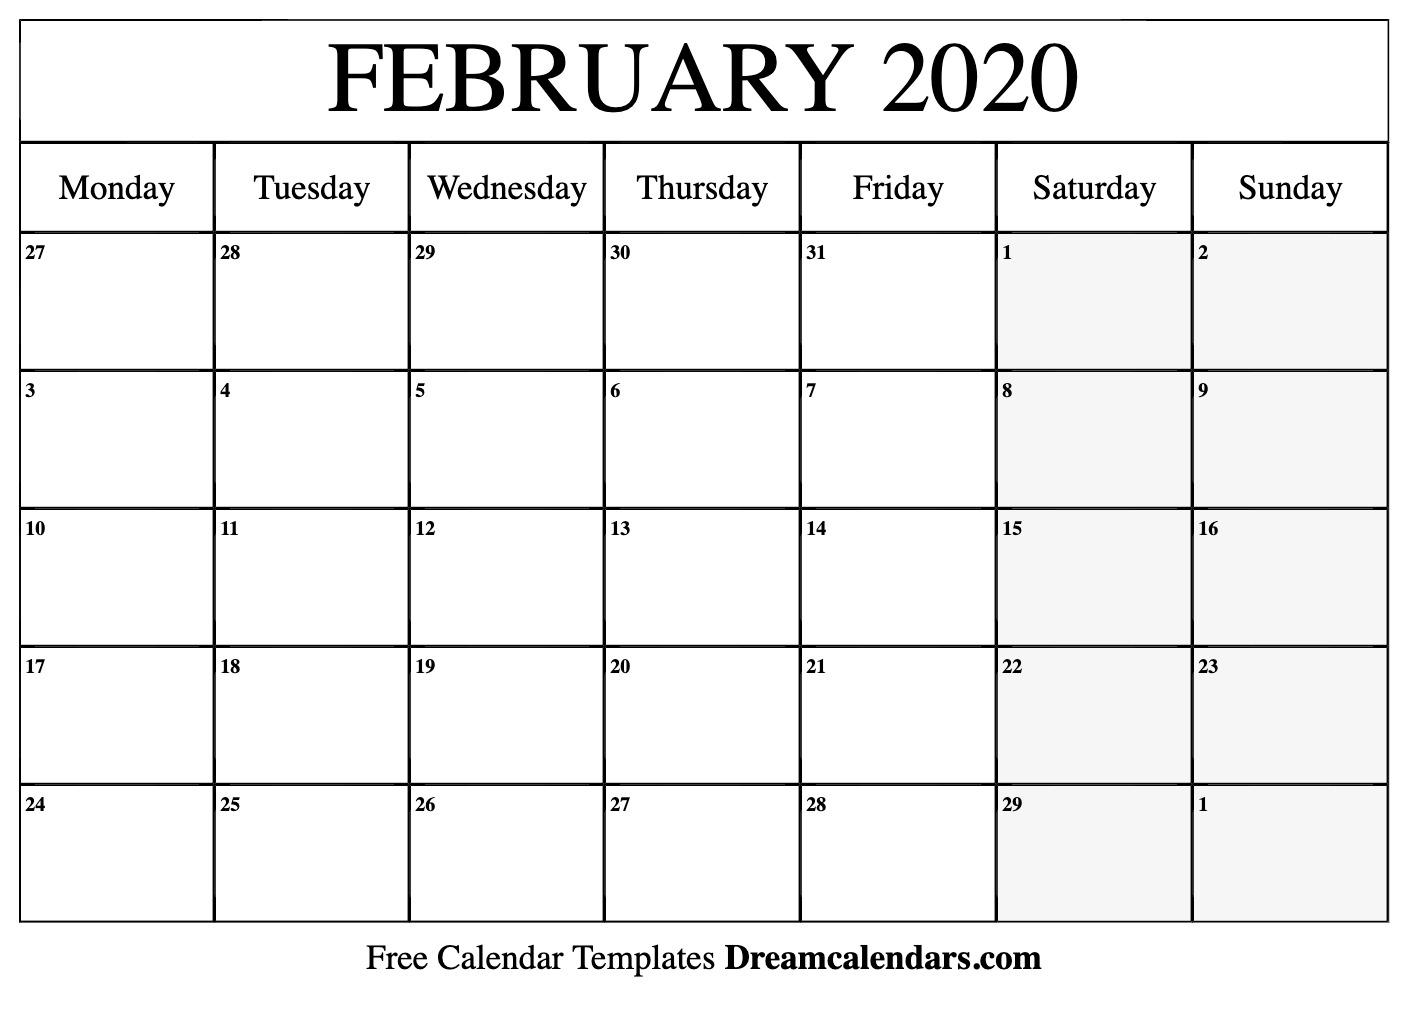 Printable February 2020 Calendar intended for 2020 Calendar Sunday To Saturday